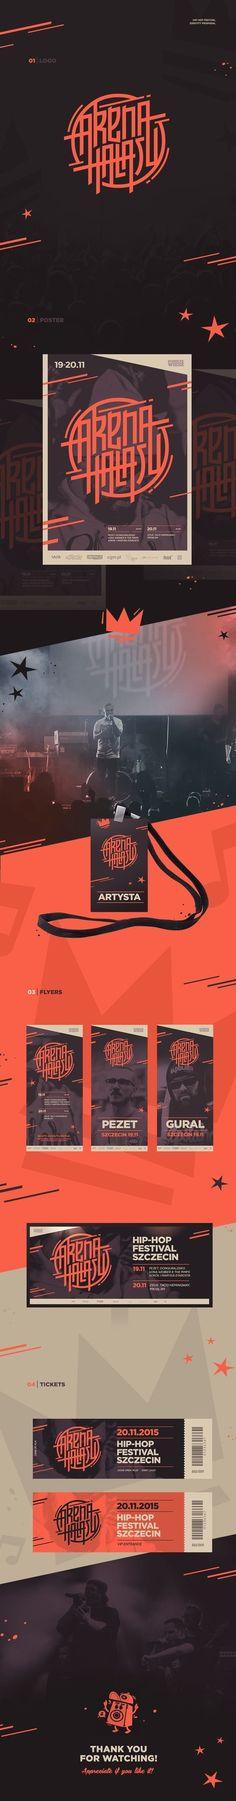 Arena Hałasu hip hop festival Branding by Piotr Kubicki in Poster